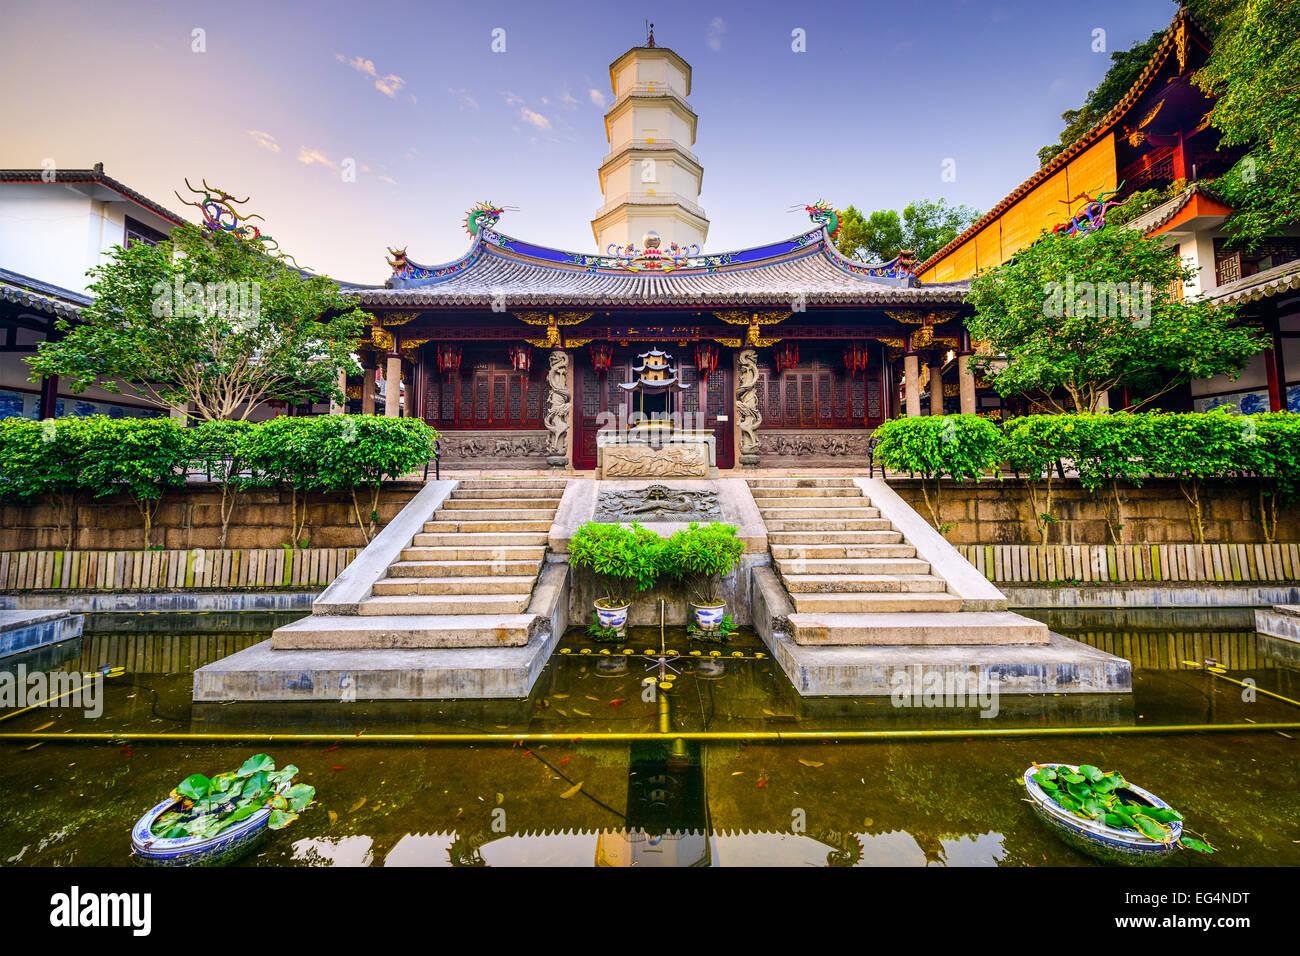 Fuzhou, Fujian, Chine au Temple de la Pagode blanche sur la Colline Yushan. Photo Stock